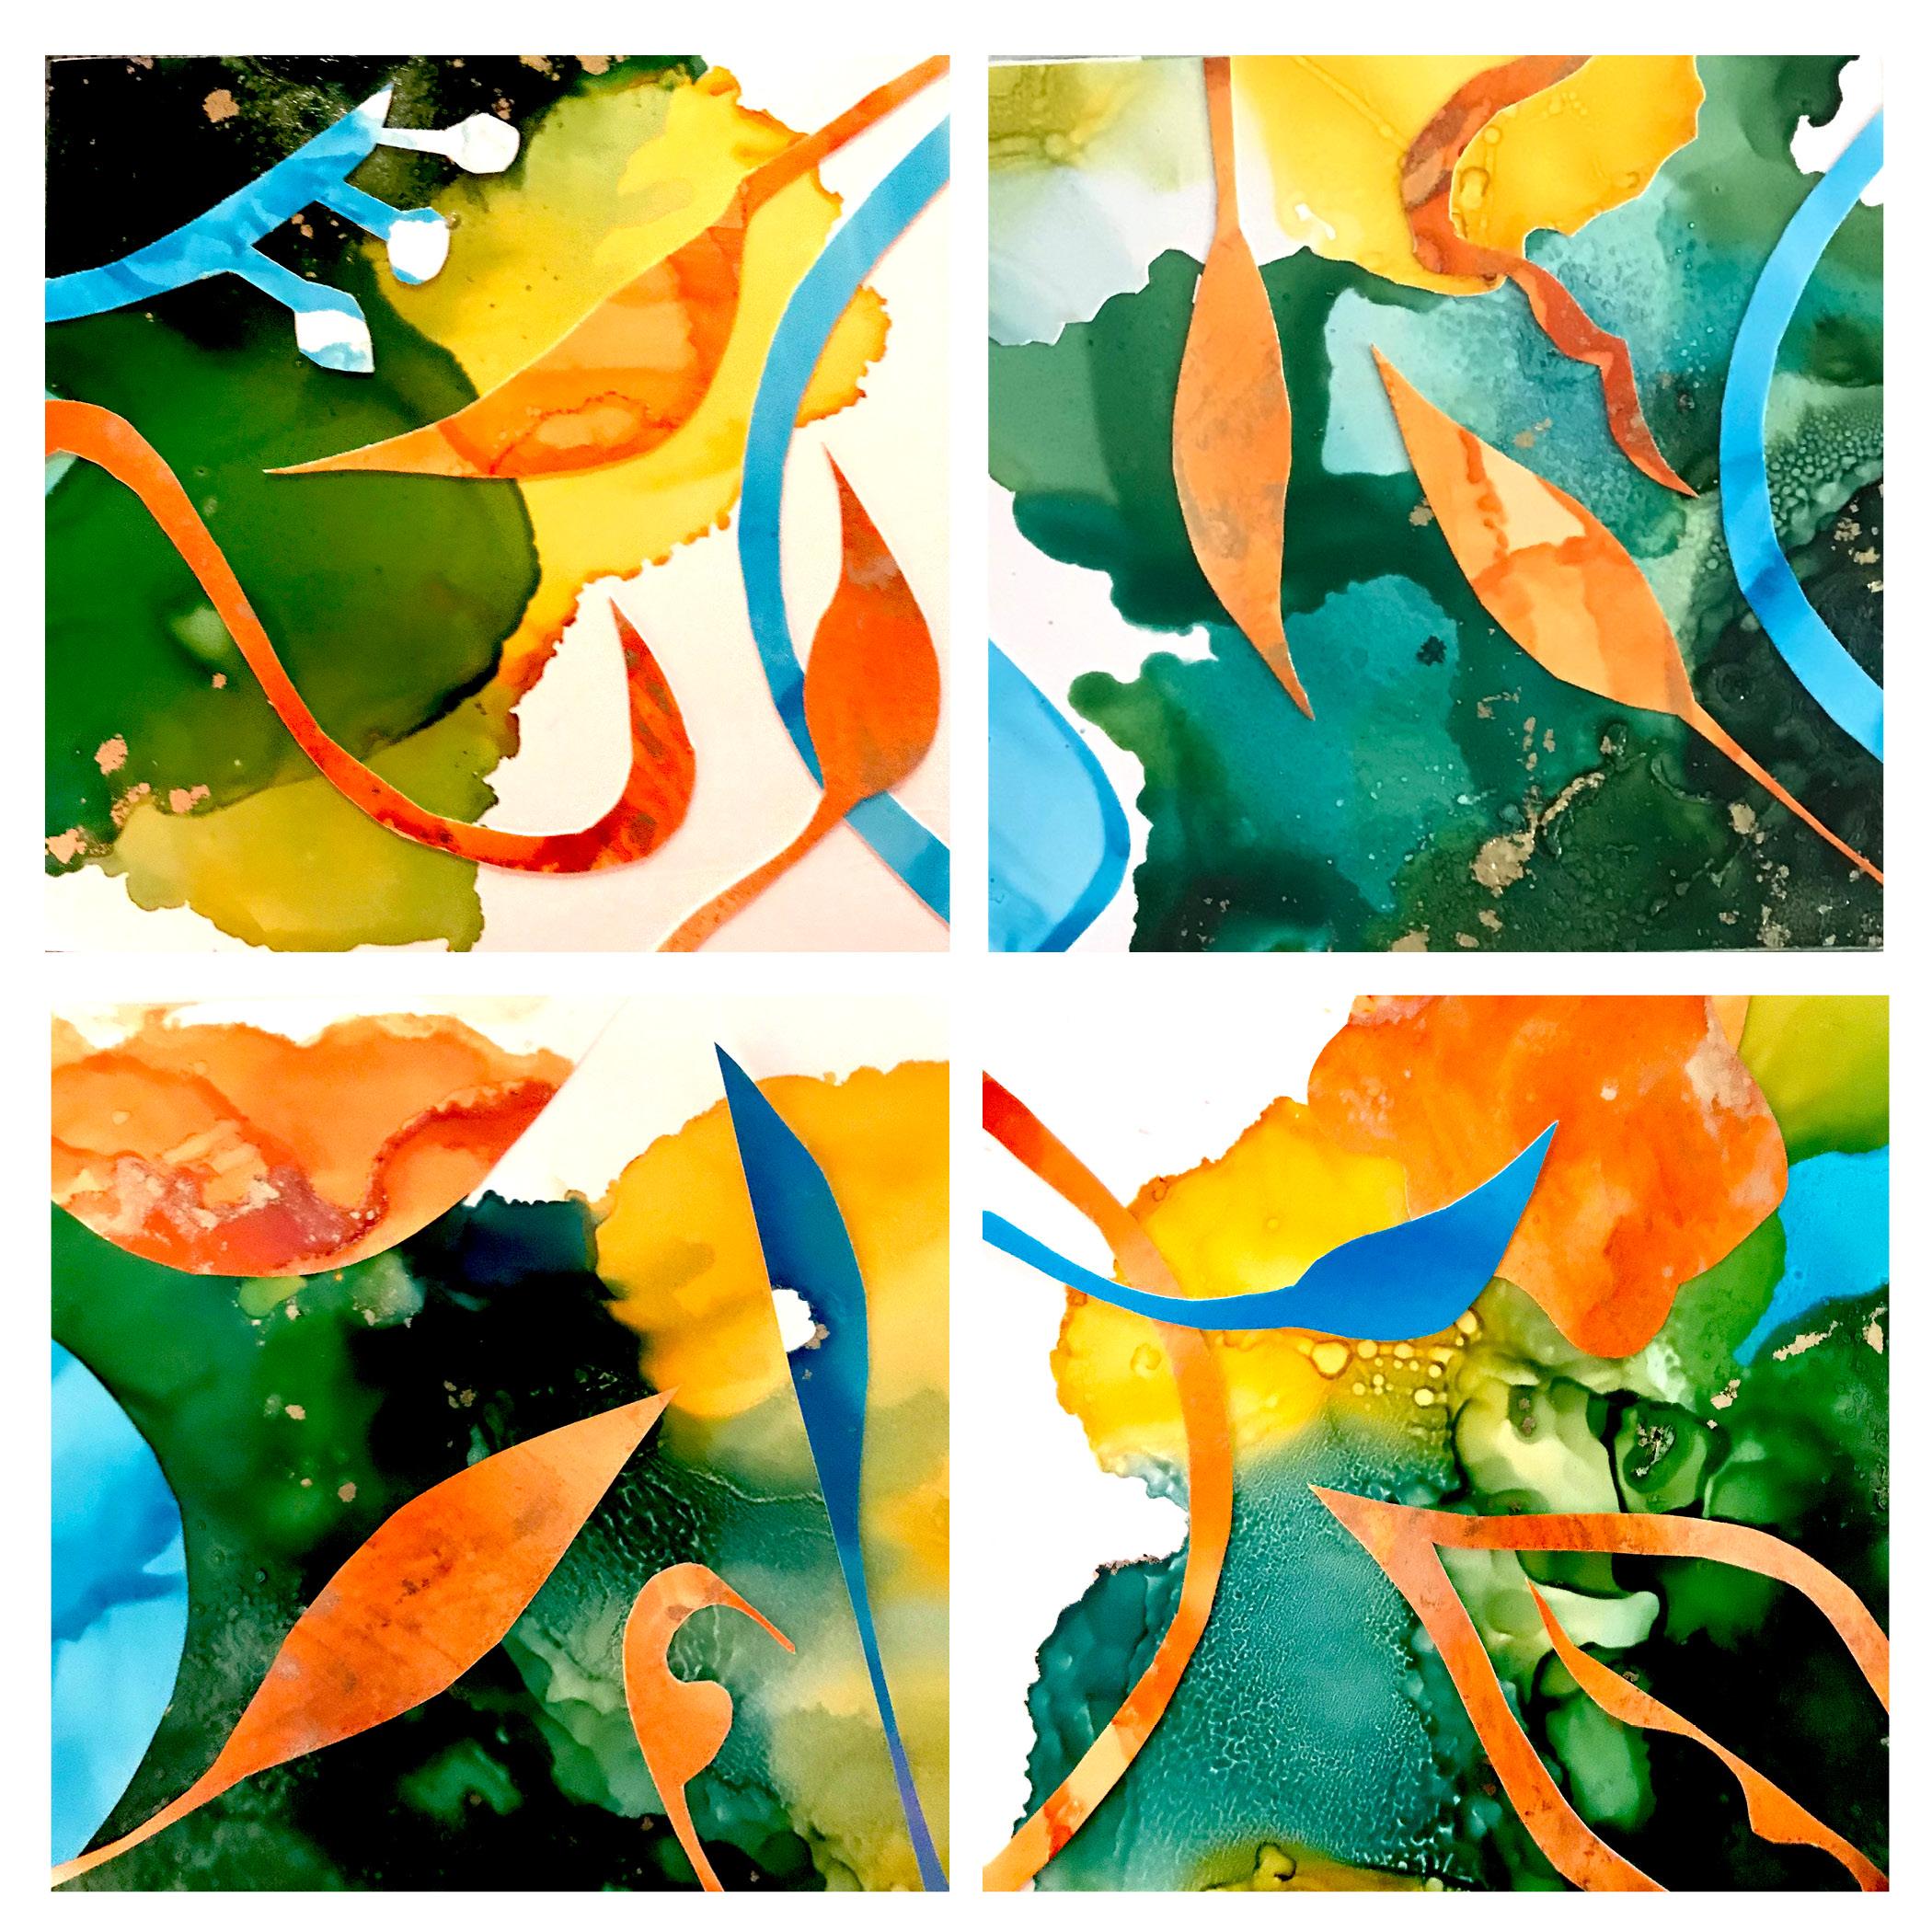 YIN: Earth Goddess Series: Tendrils of Time & Tide ~ Reawakening